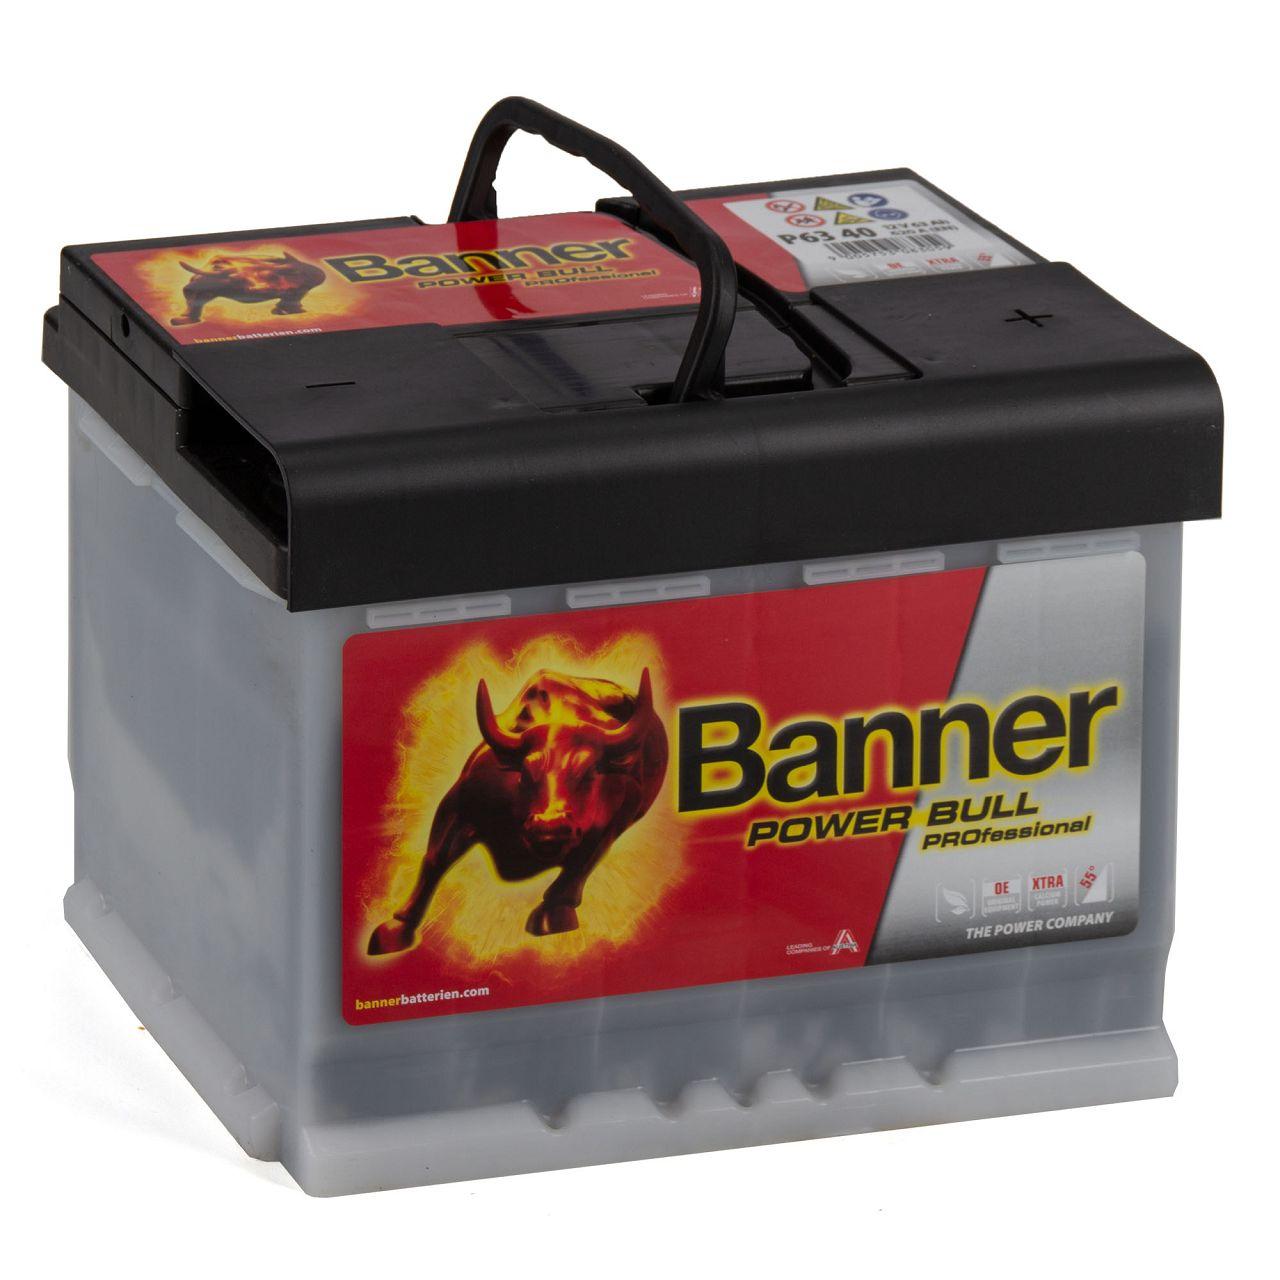 BANNER PROP6340 PRO P6340 Power Bull Professional Autobatterie Batterie 12V 63Ah